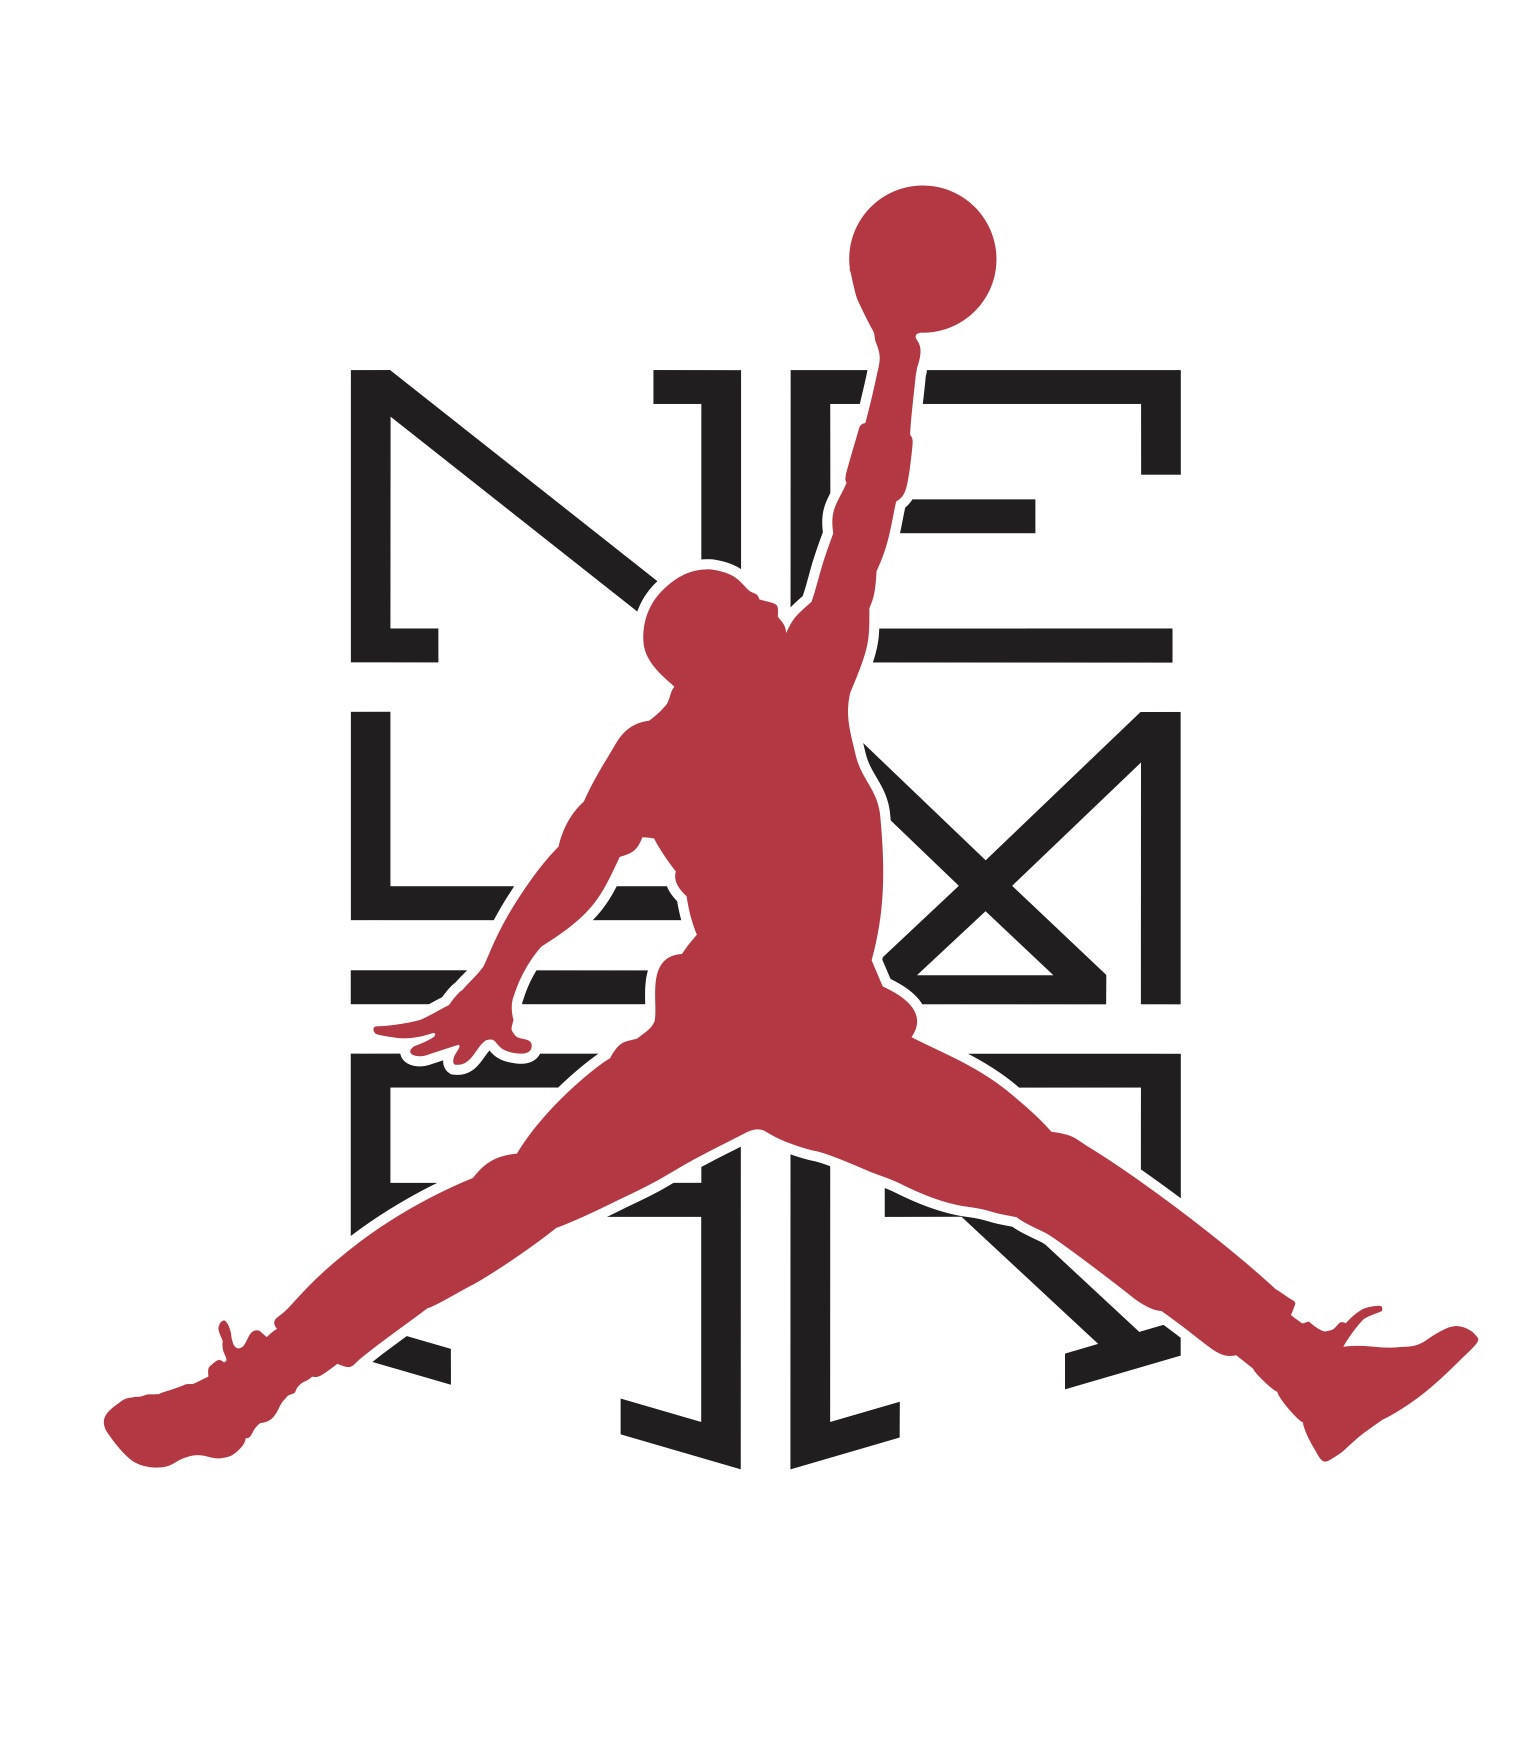 Zapatos tienda condón  Nike Air Logo Wallpaper Neymar Jordan Logo Hd Wallpapers - Neymar Logo -  1540x1762 - Download HD Wallpaper - WallpaperTip